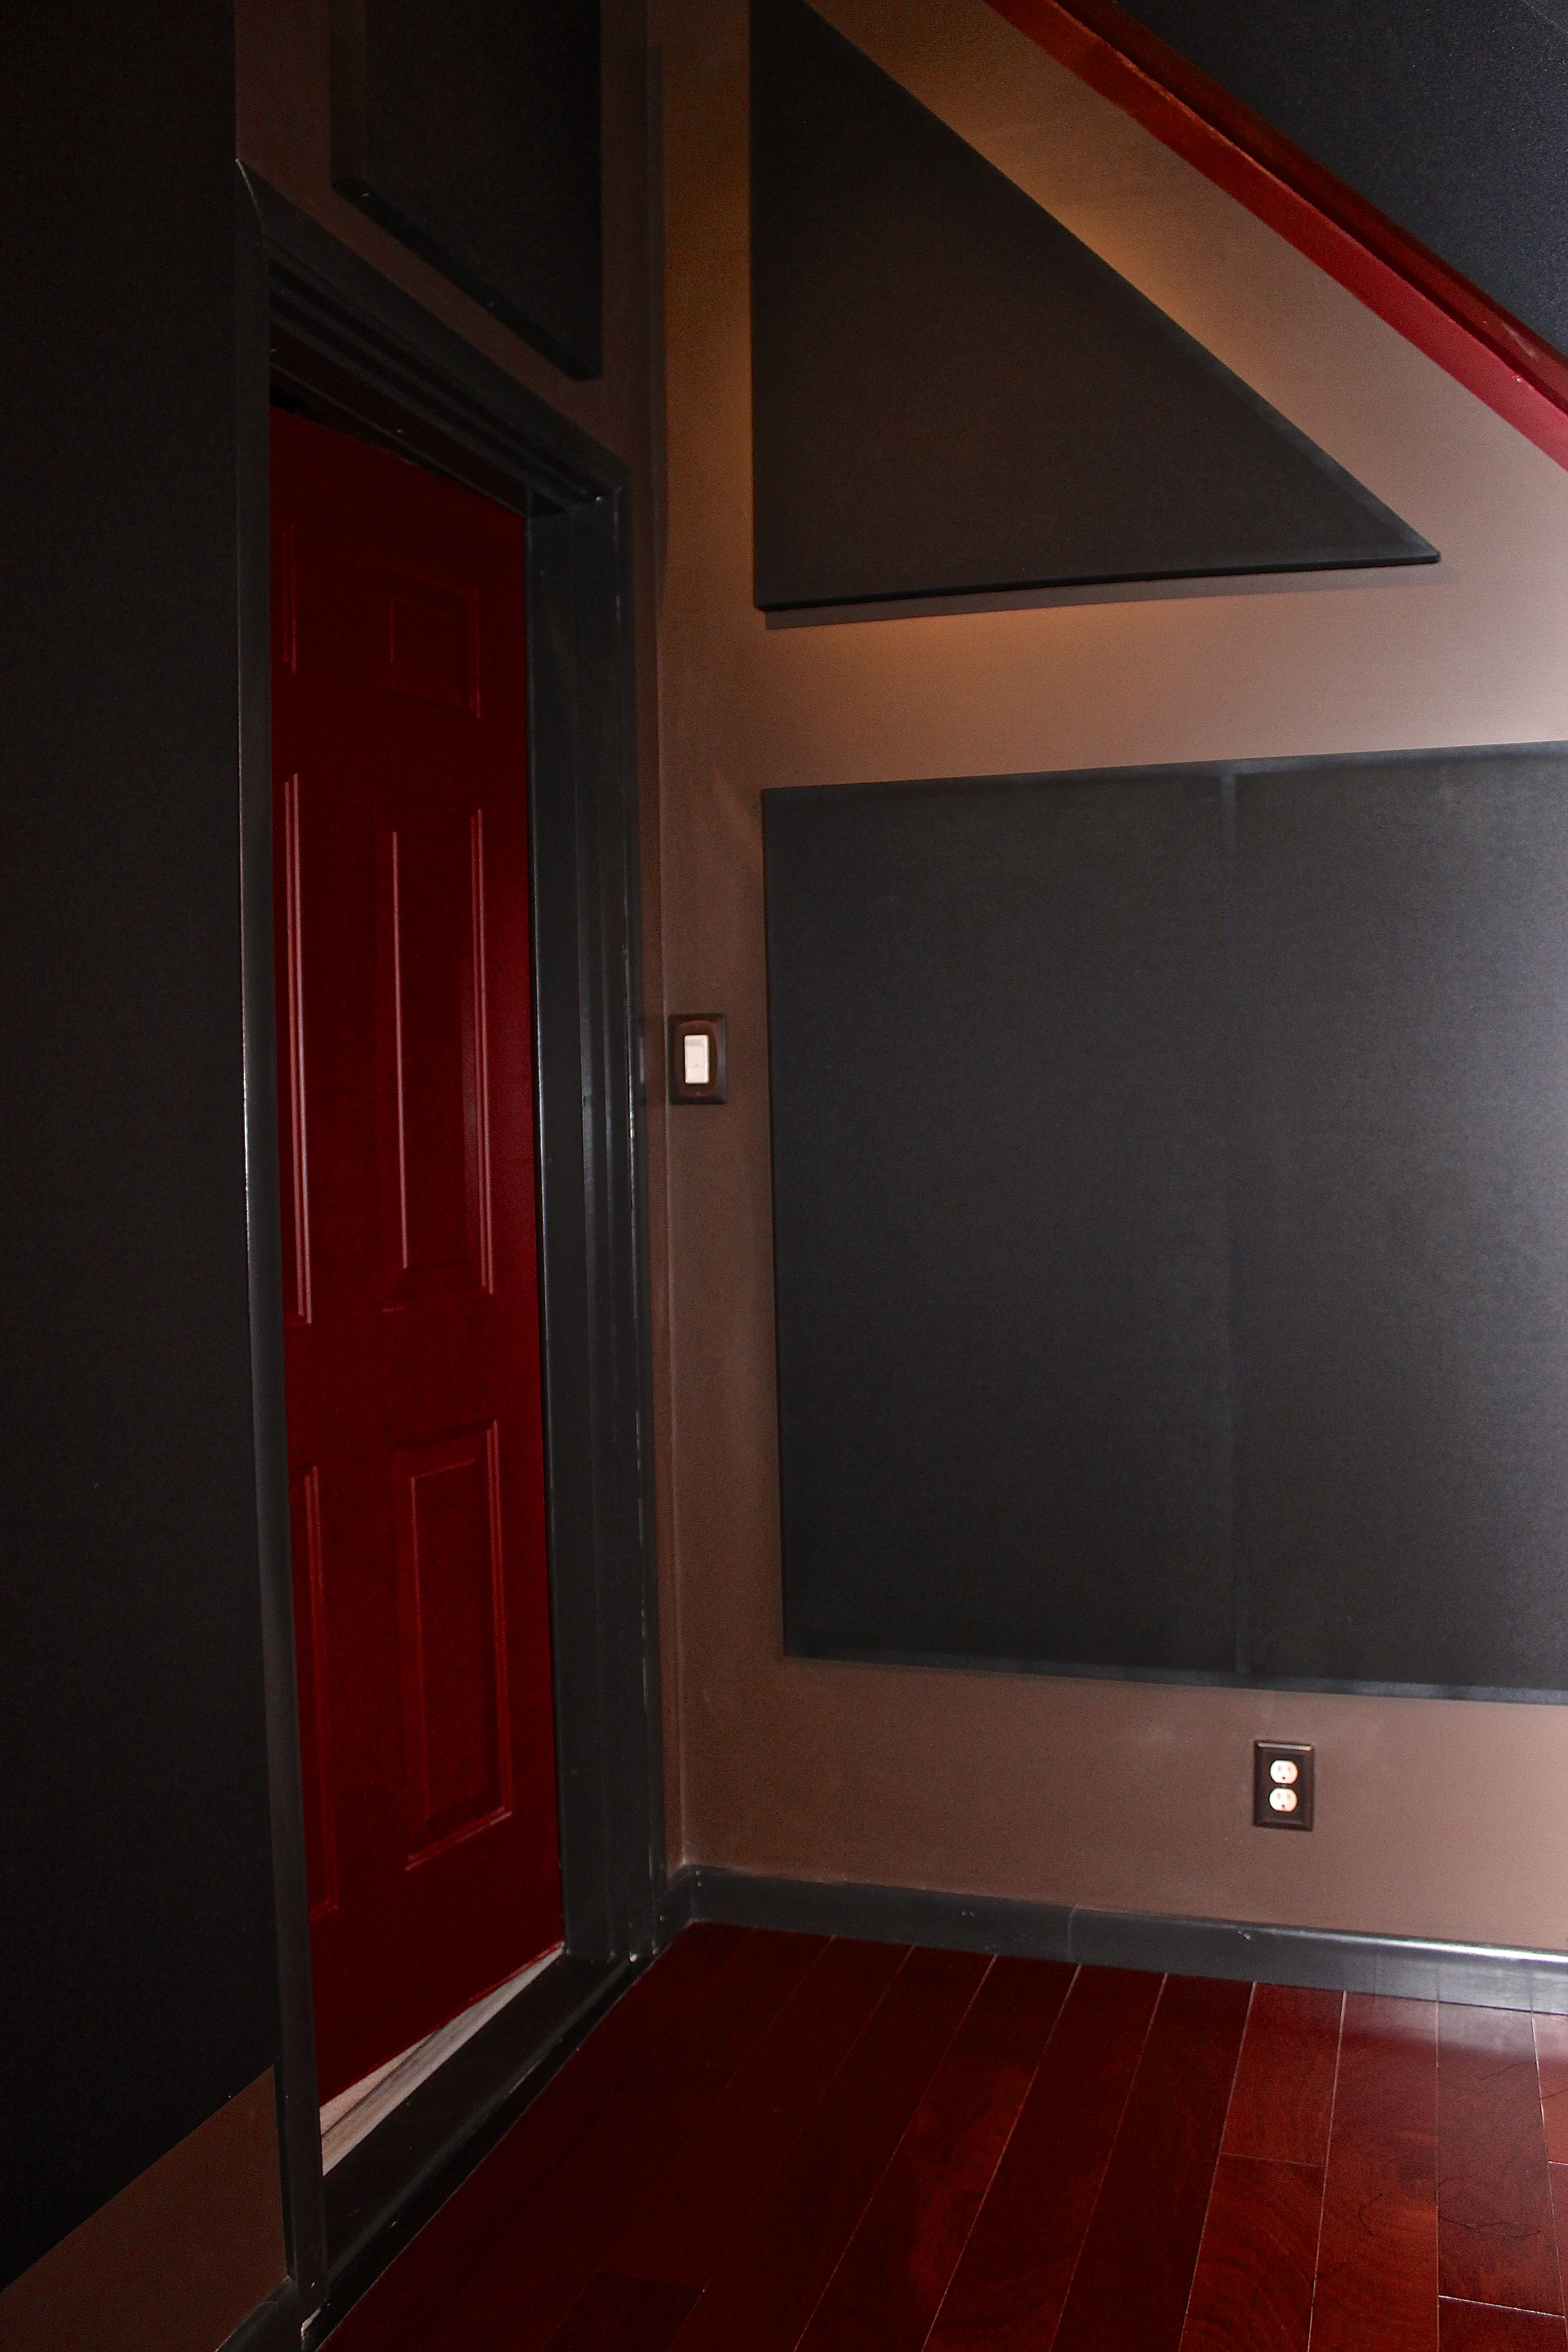 Studio A - Inside